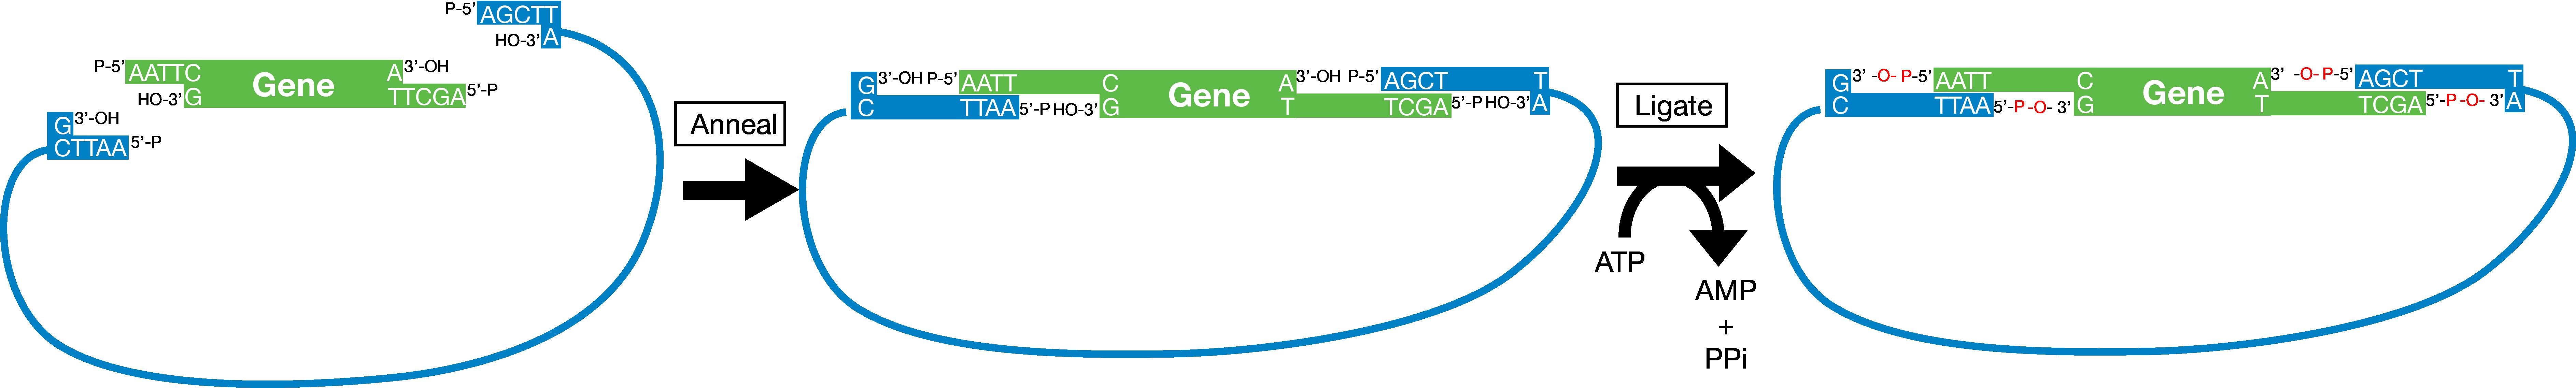 Ligation Process